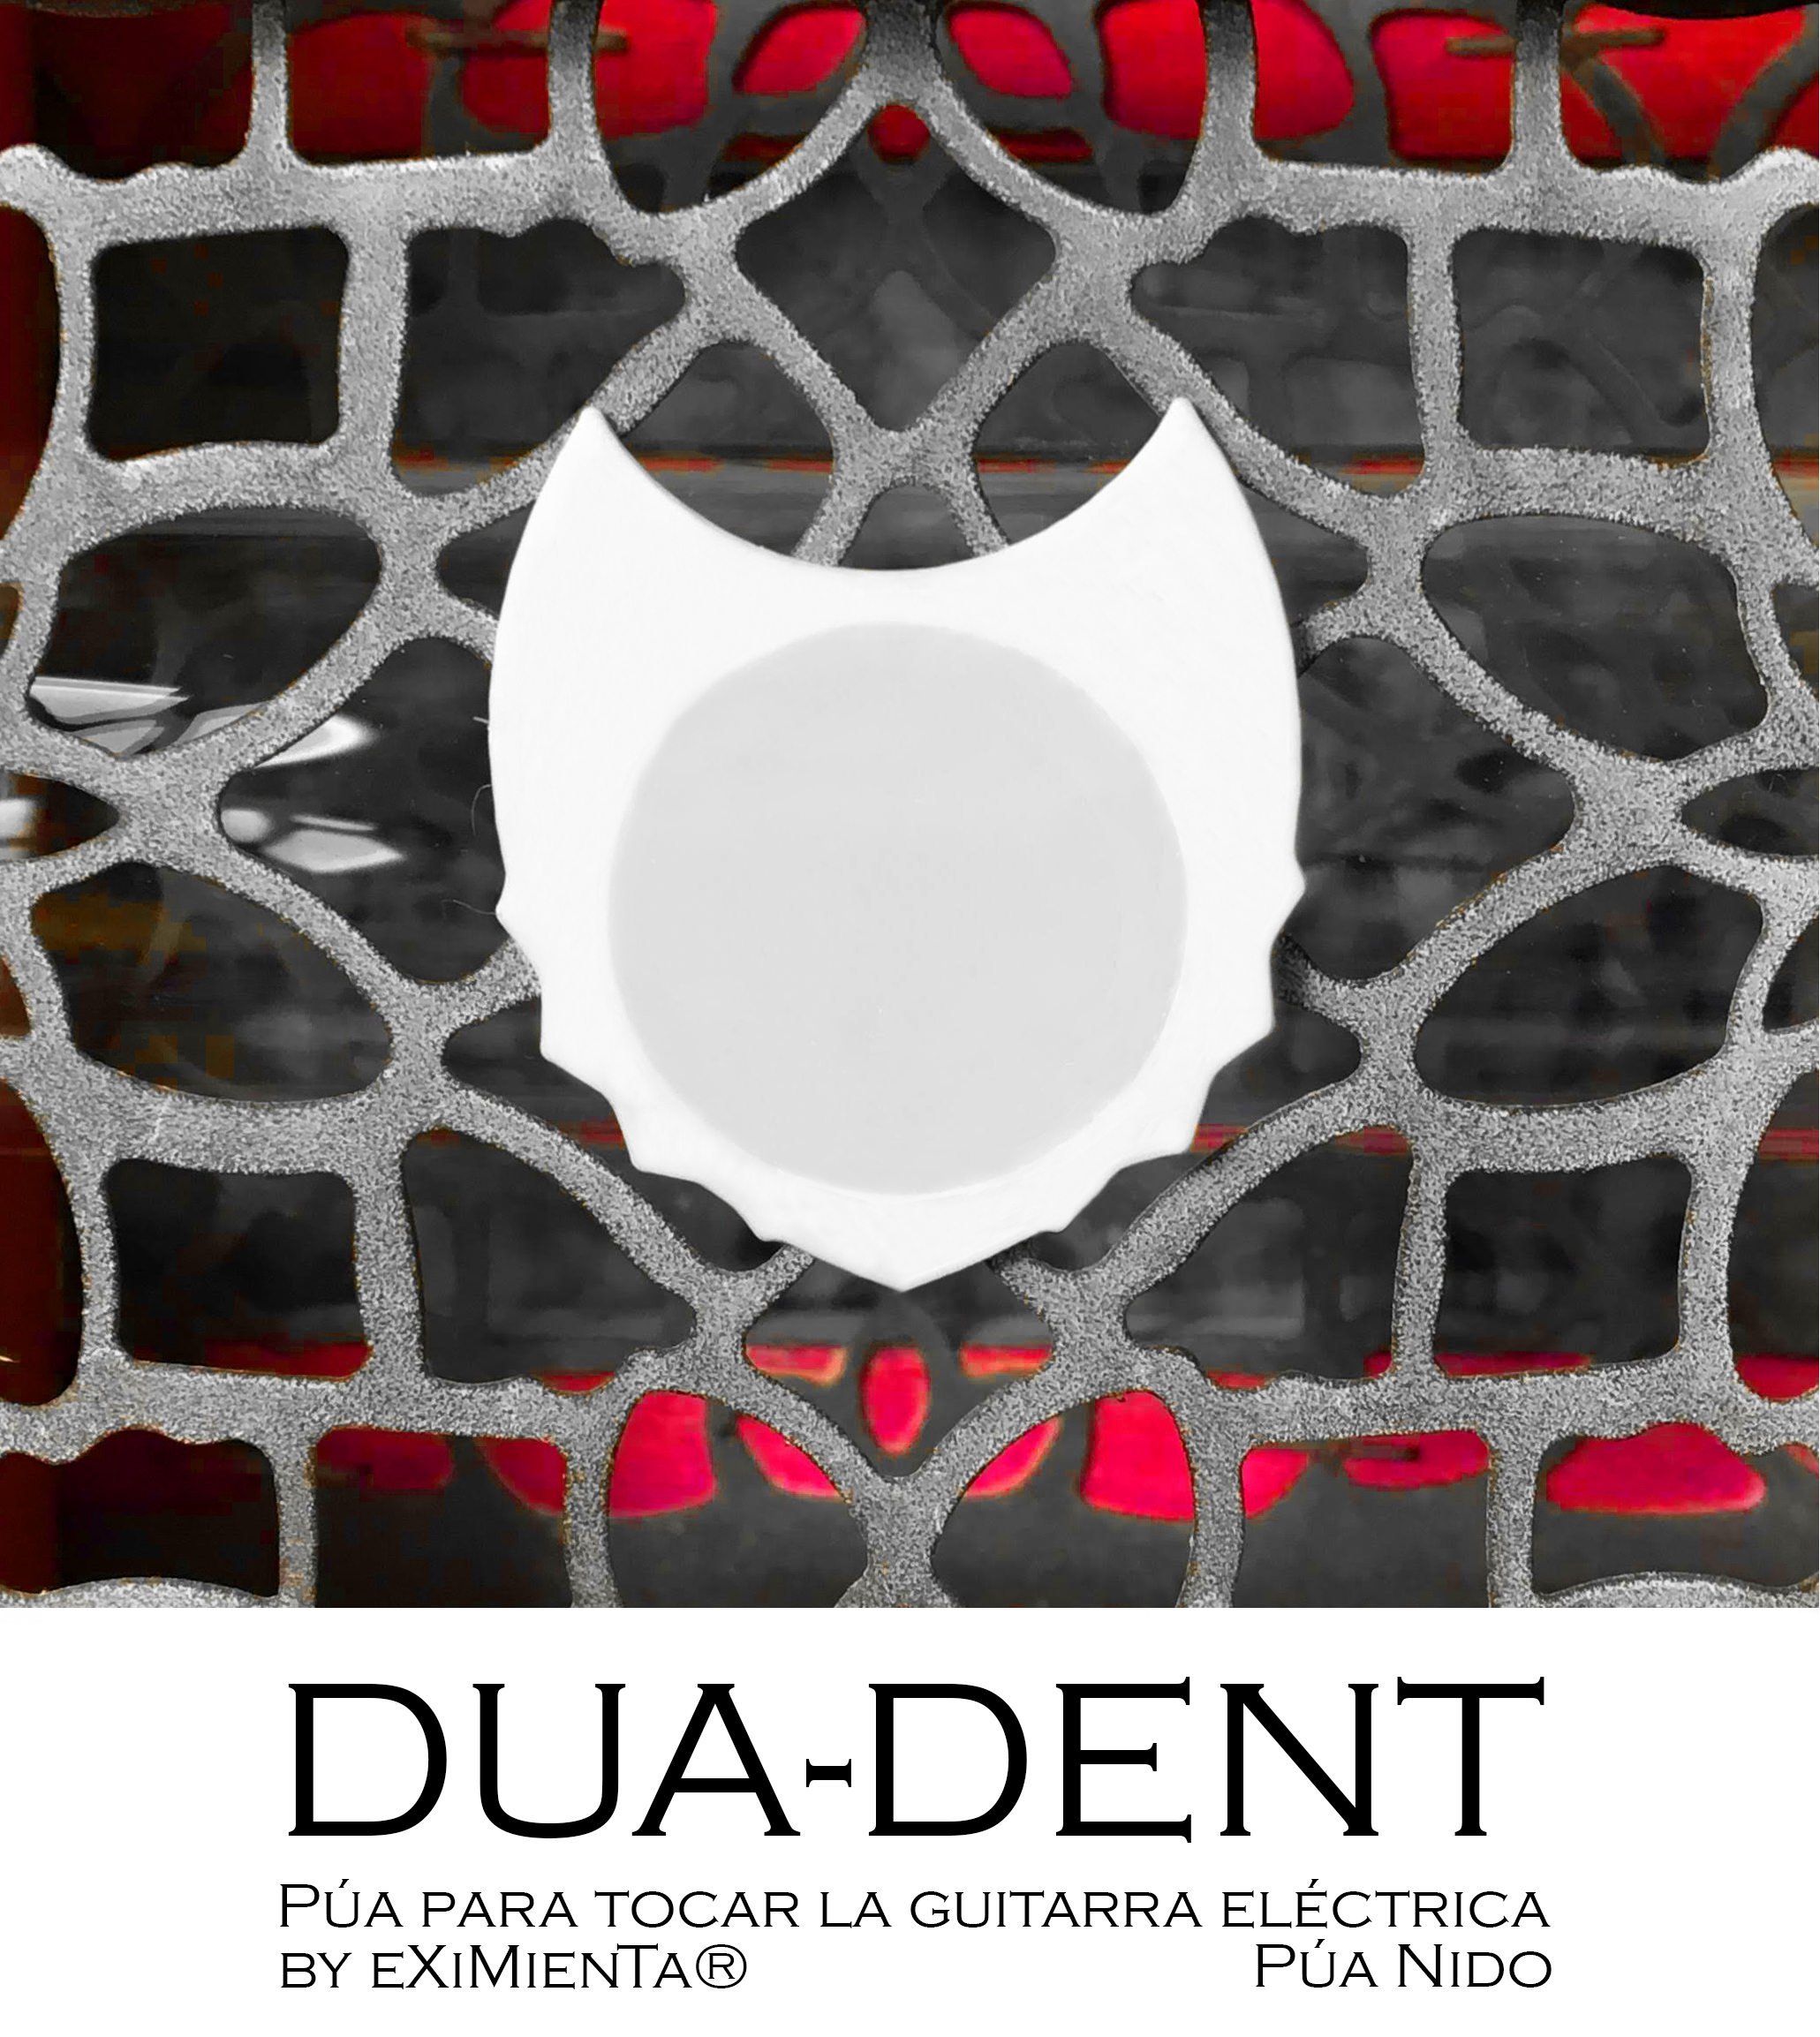 DUA-DENT 04-Abril-2020 by eXiMienTa.jpg Download free STL file DUA-DENT 01 - 02 3D Guitar Tips • Design to 3D print, carleslluisar